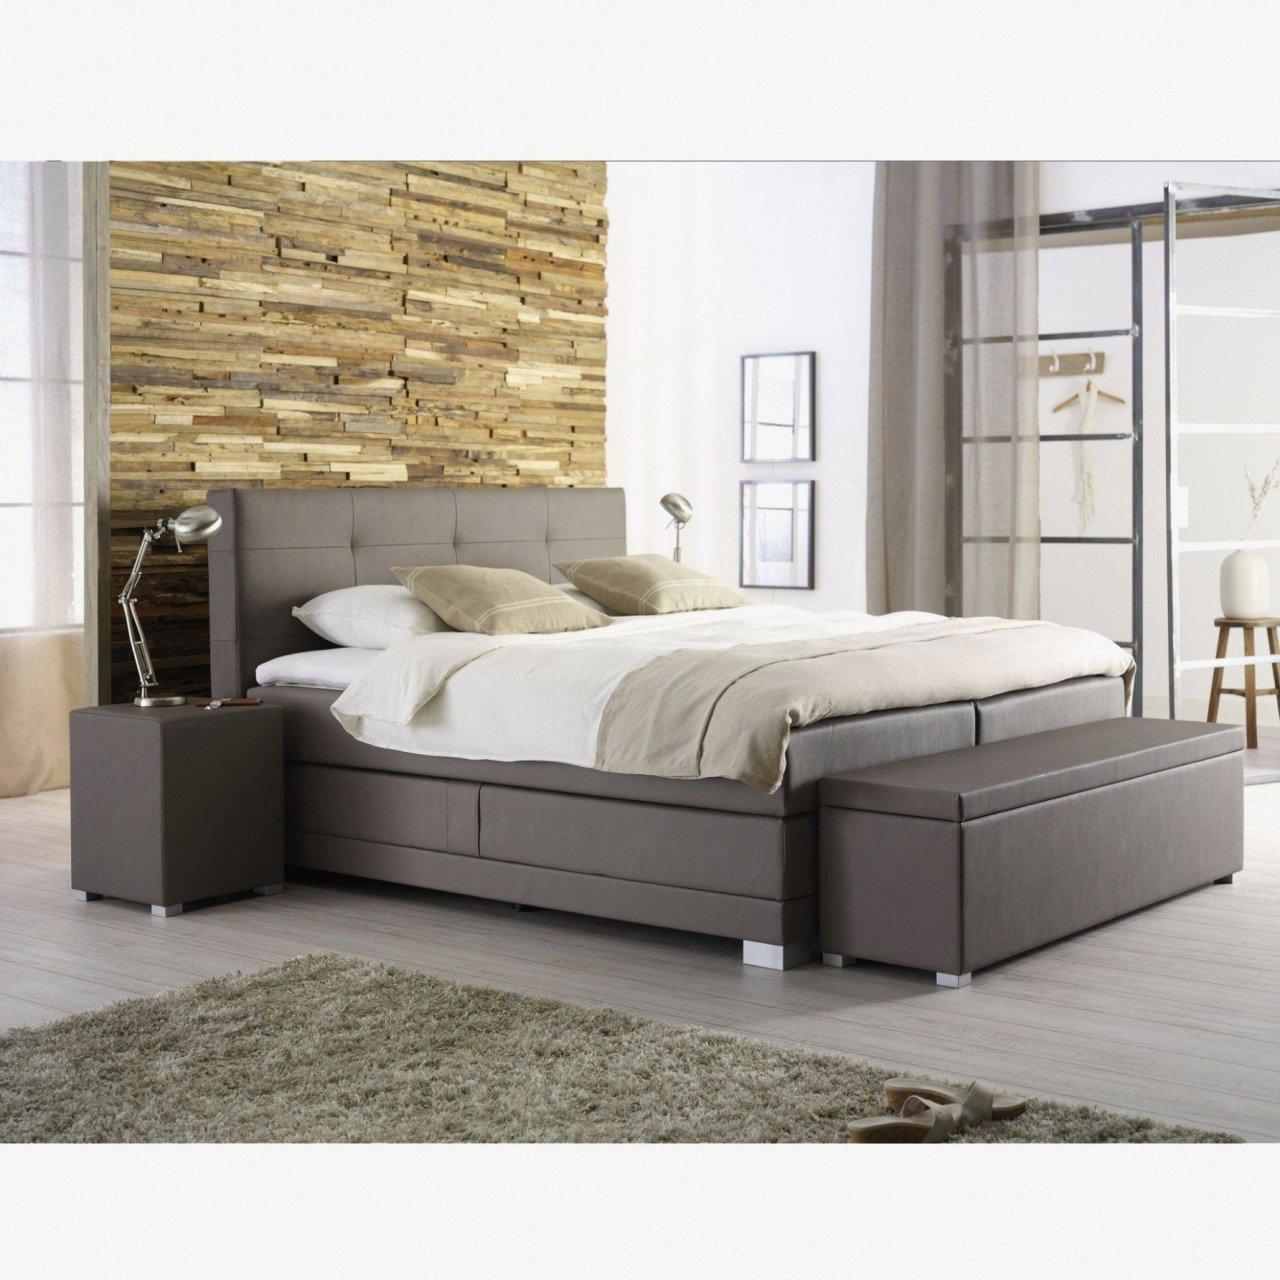 Value City Bedroom Set Awesome Green Living Room — Procura Home Blog